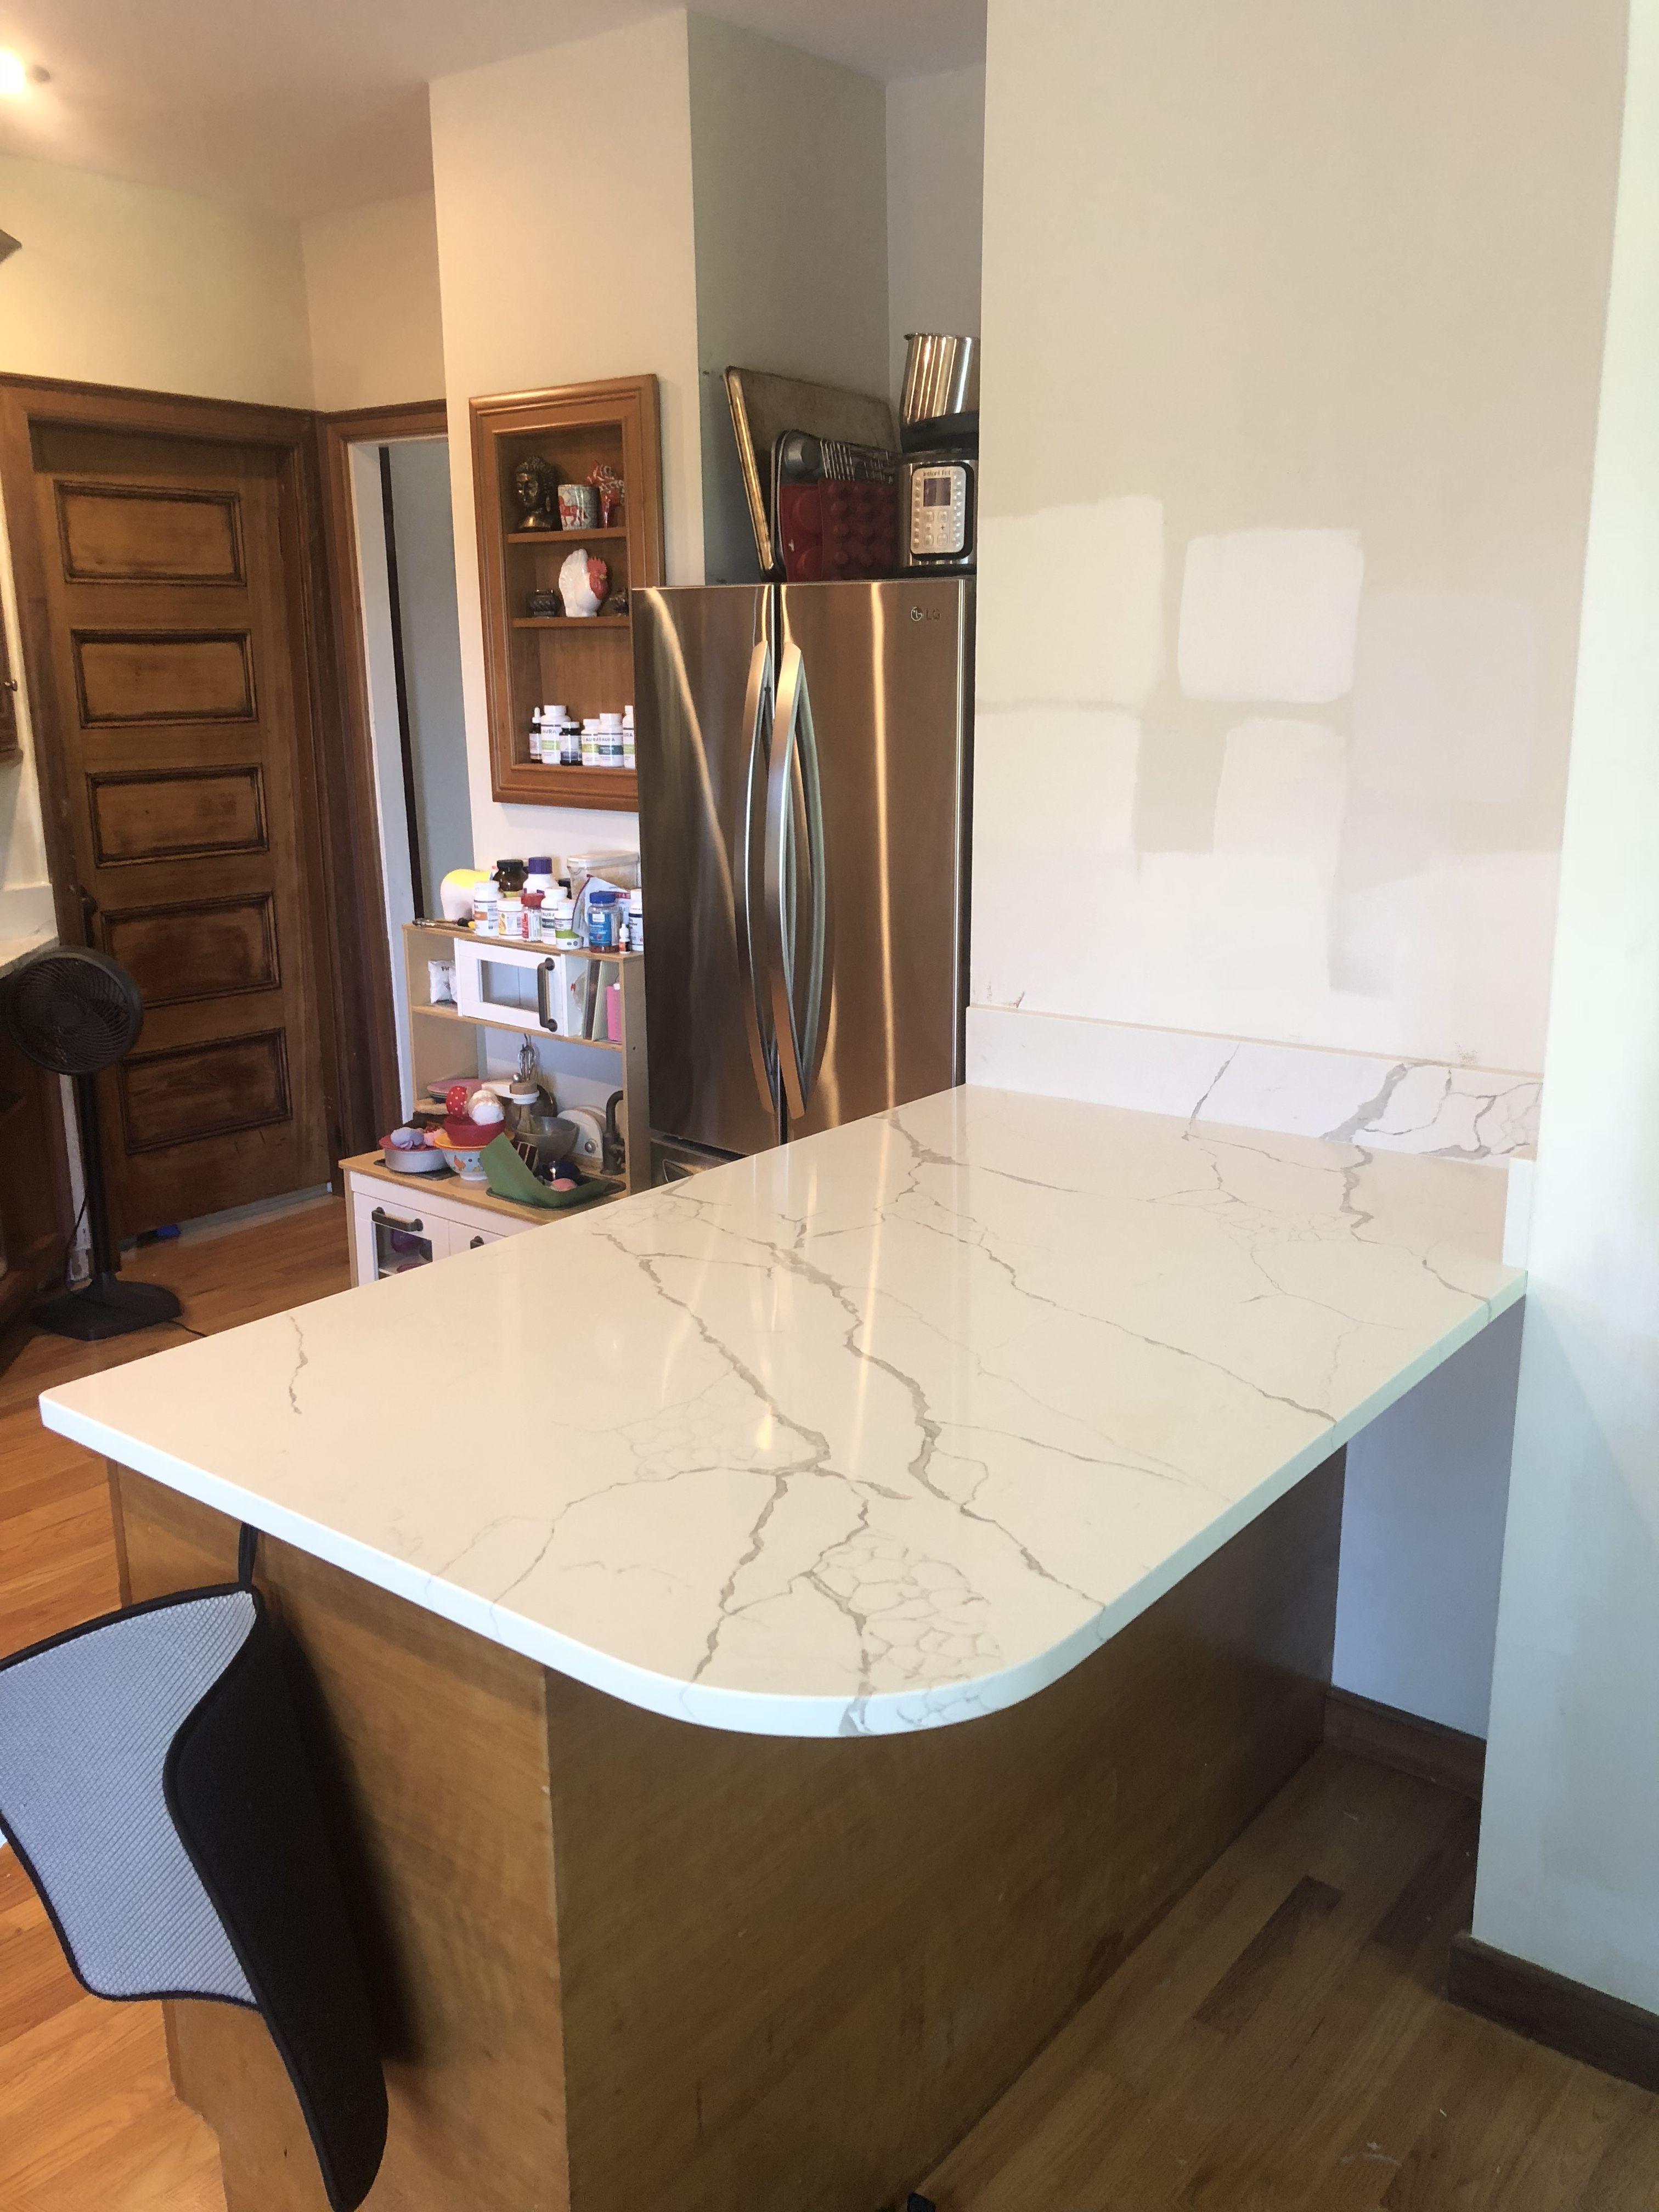 Calacatta Laza Quartz Quartz Countertops Granite Countertops